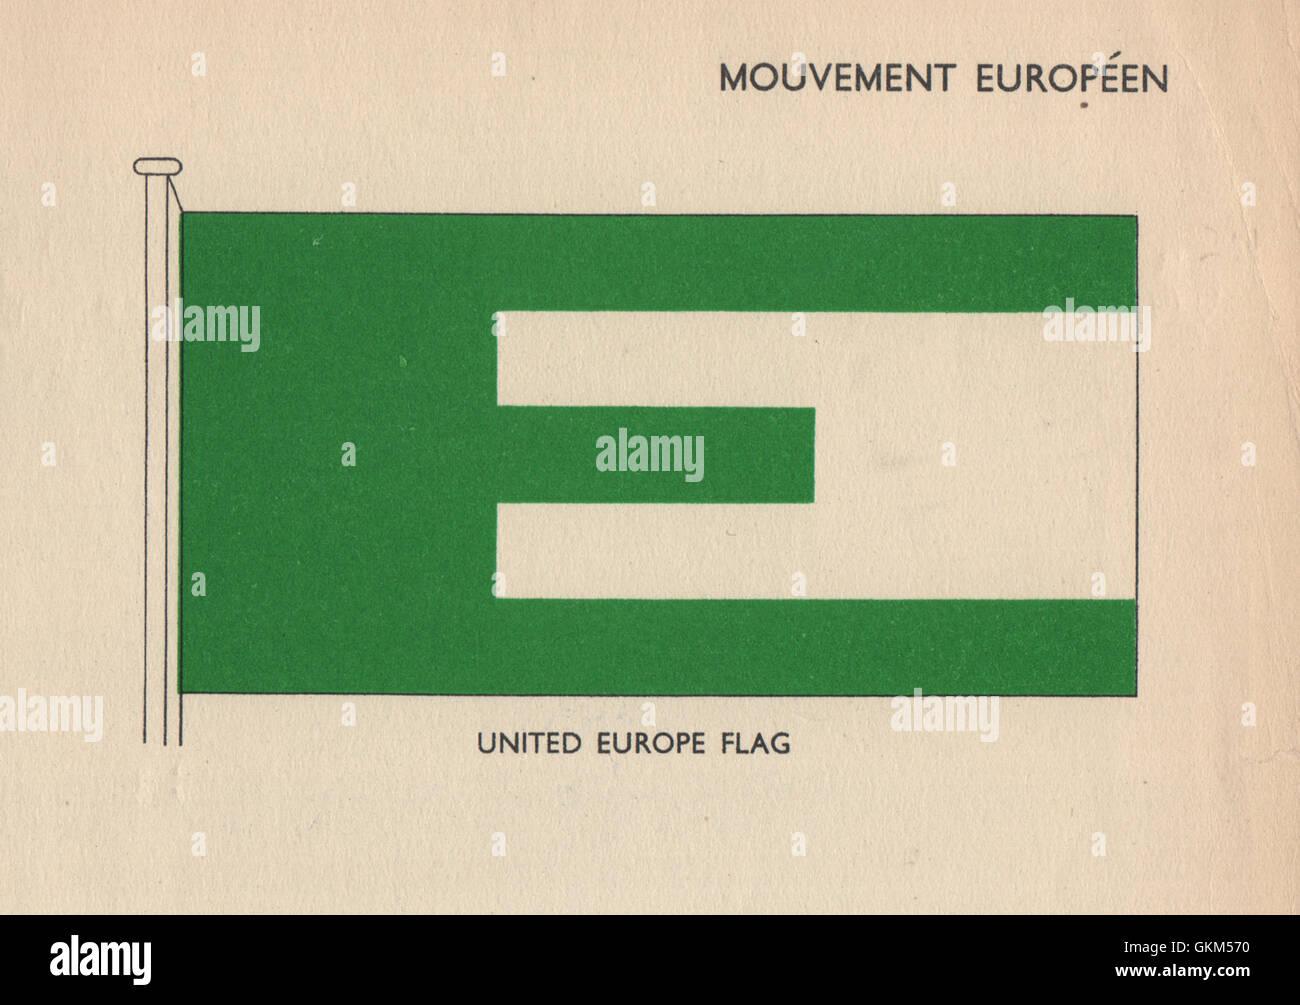 MOUVEMENT EUROPÉEN FLAG. United Europe Flag. EC EEC EU. European Union, 1958 - Stock Image